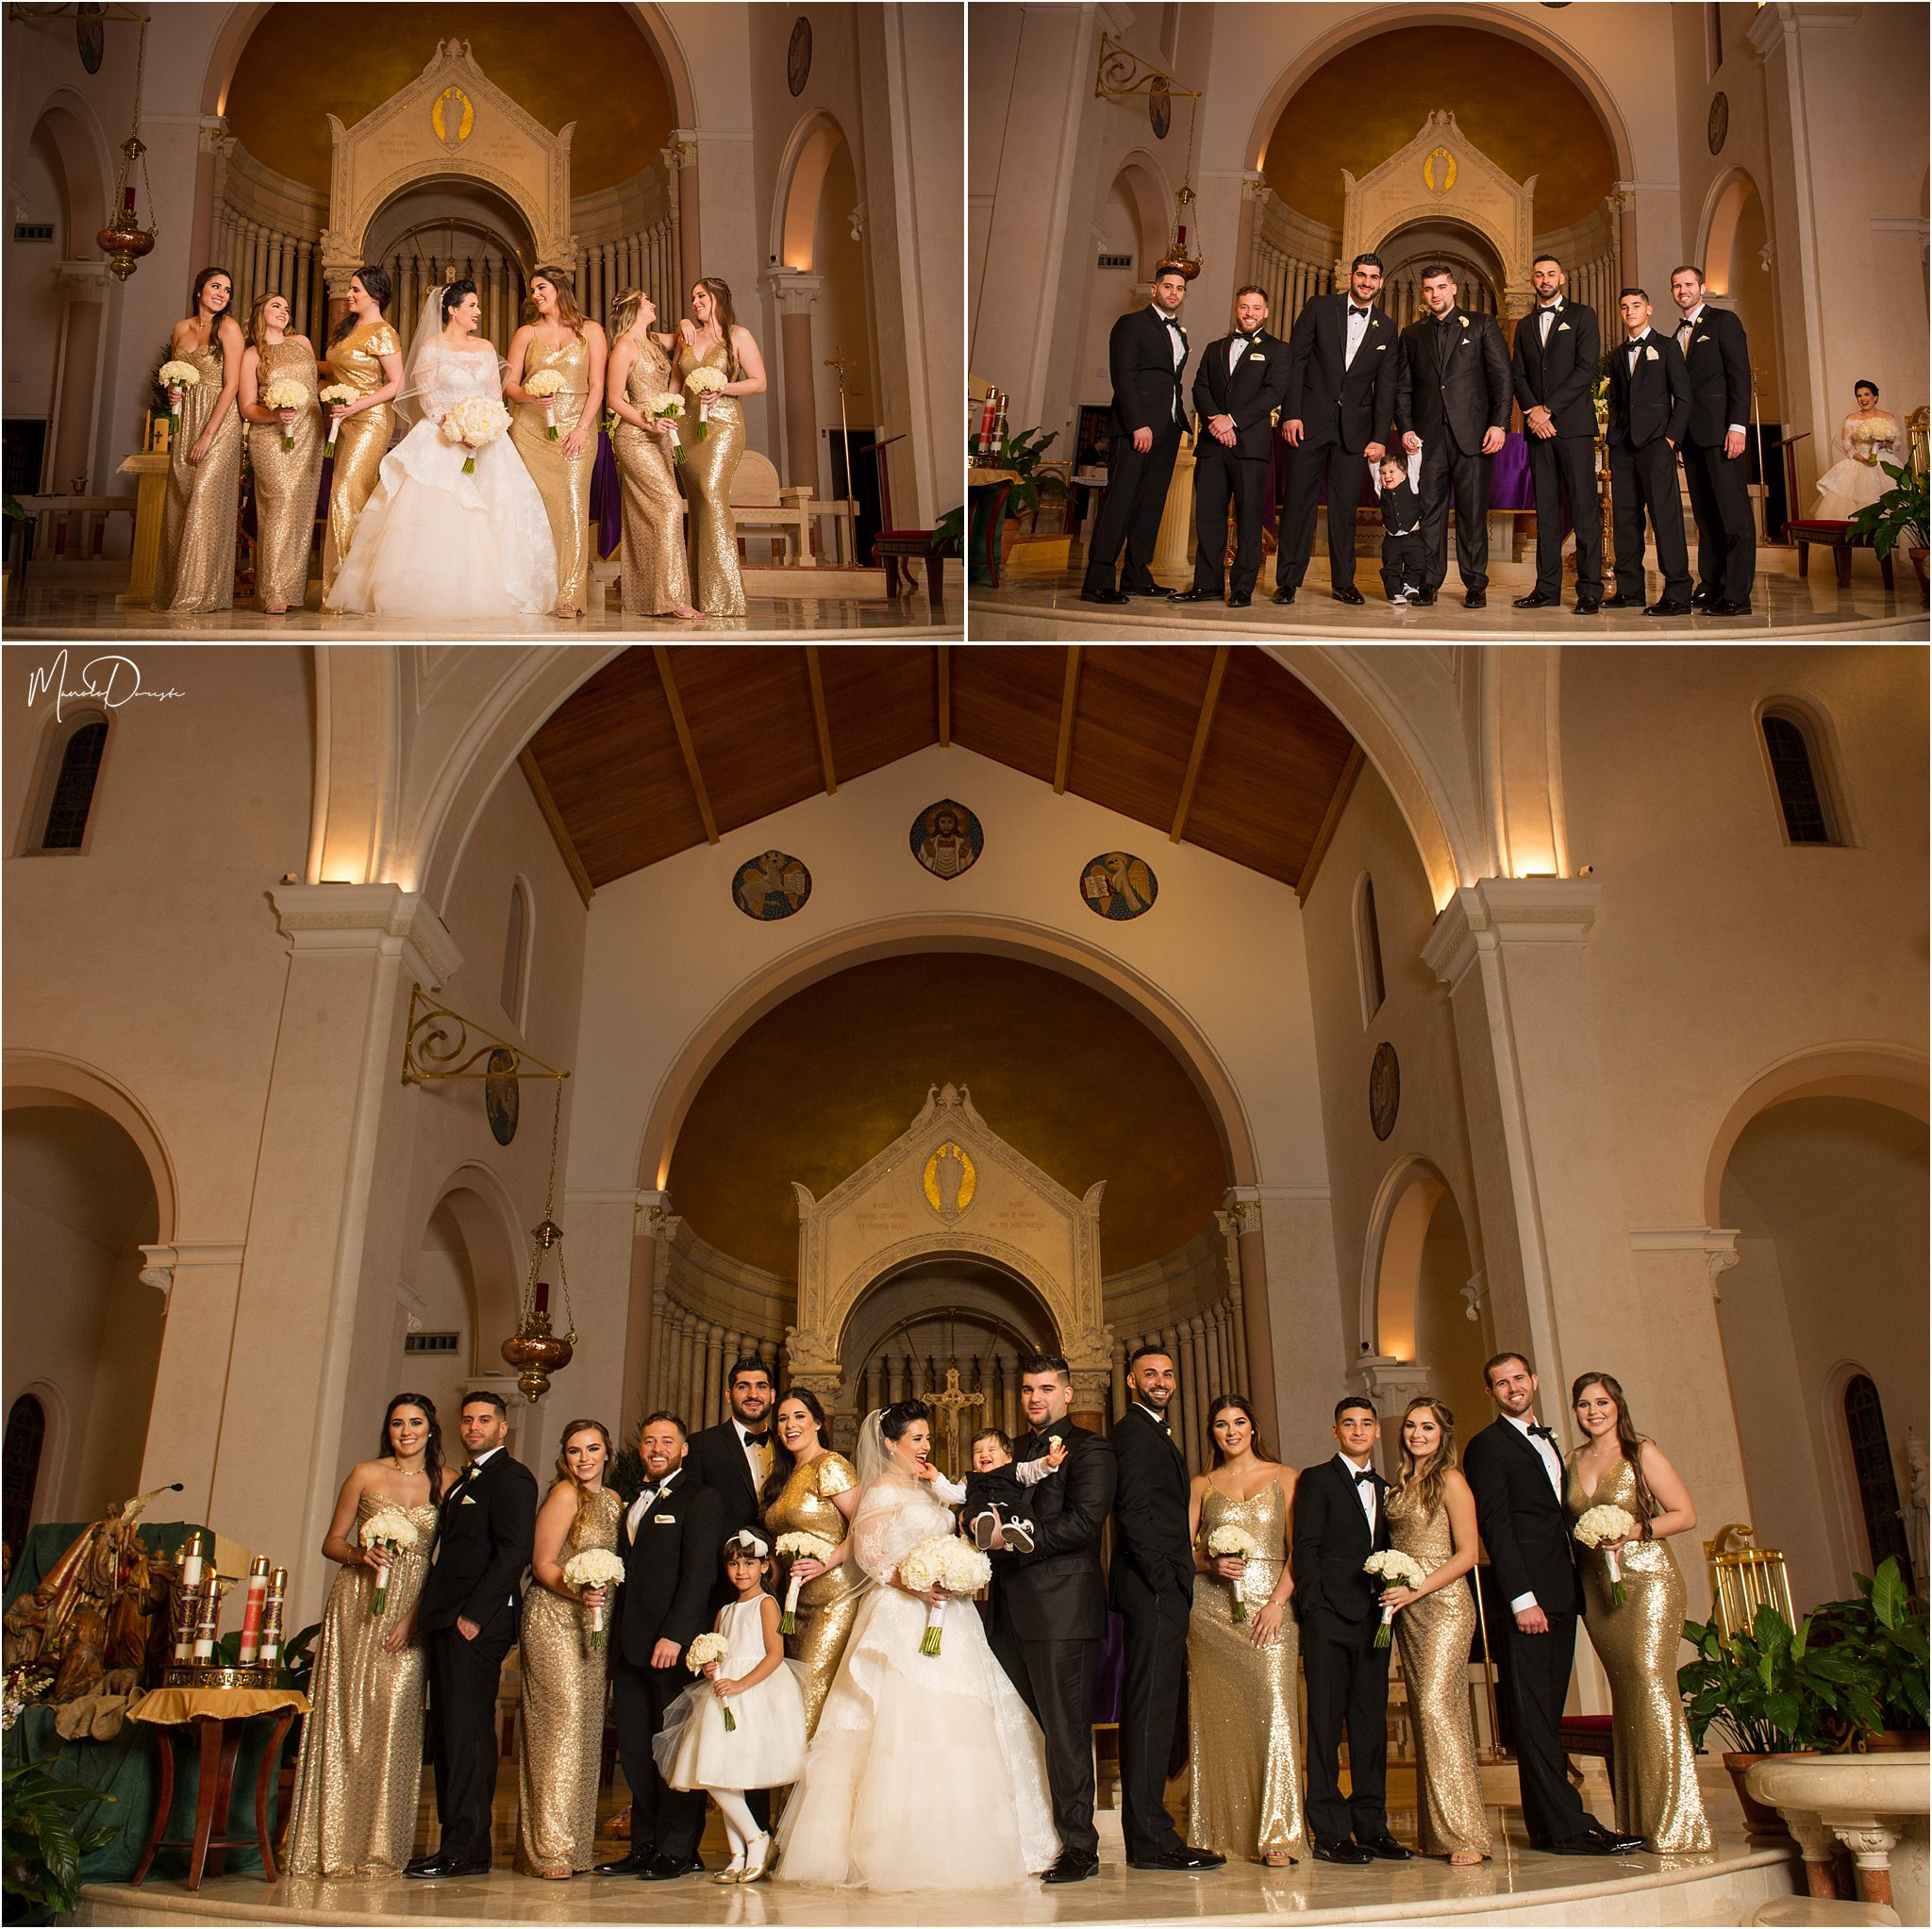 00964_ManoloDoreste_InFocusStudios_Wedding_Family_Photography_Miami_MiamiPhotographer.jpg